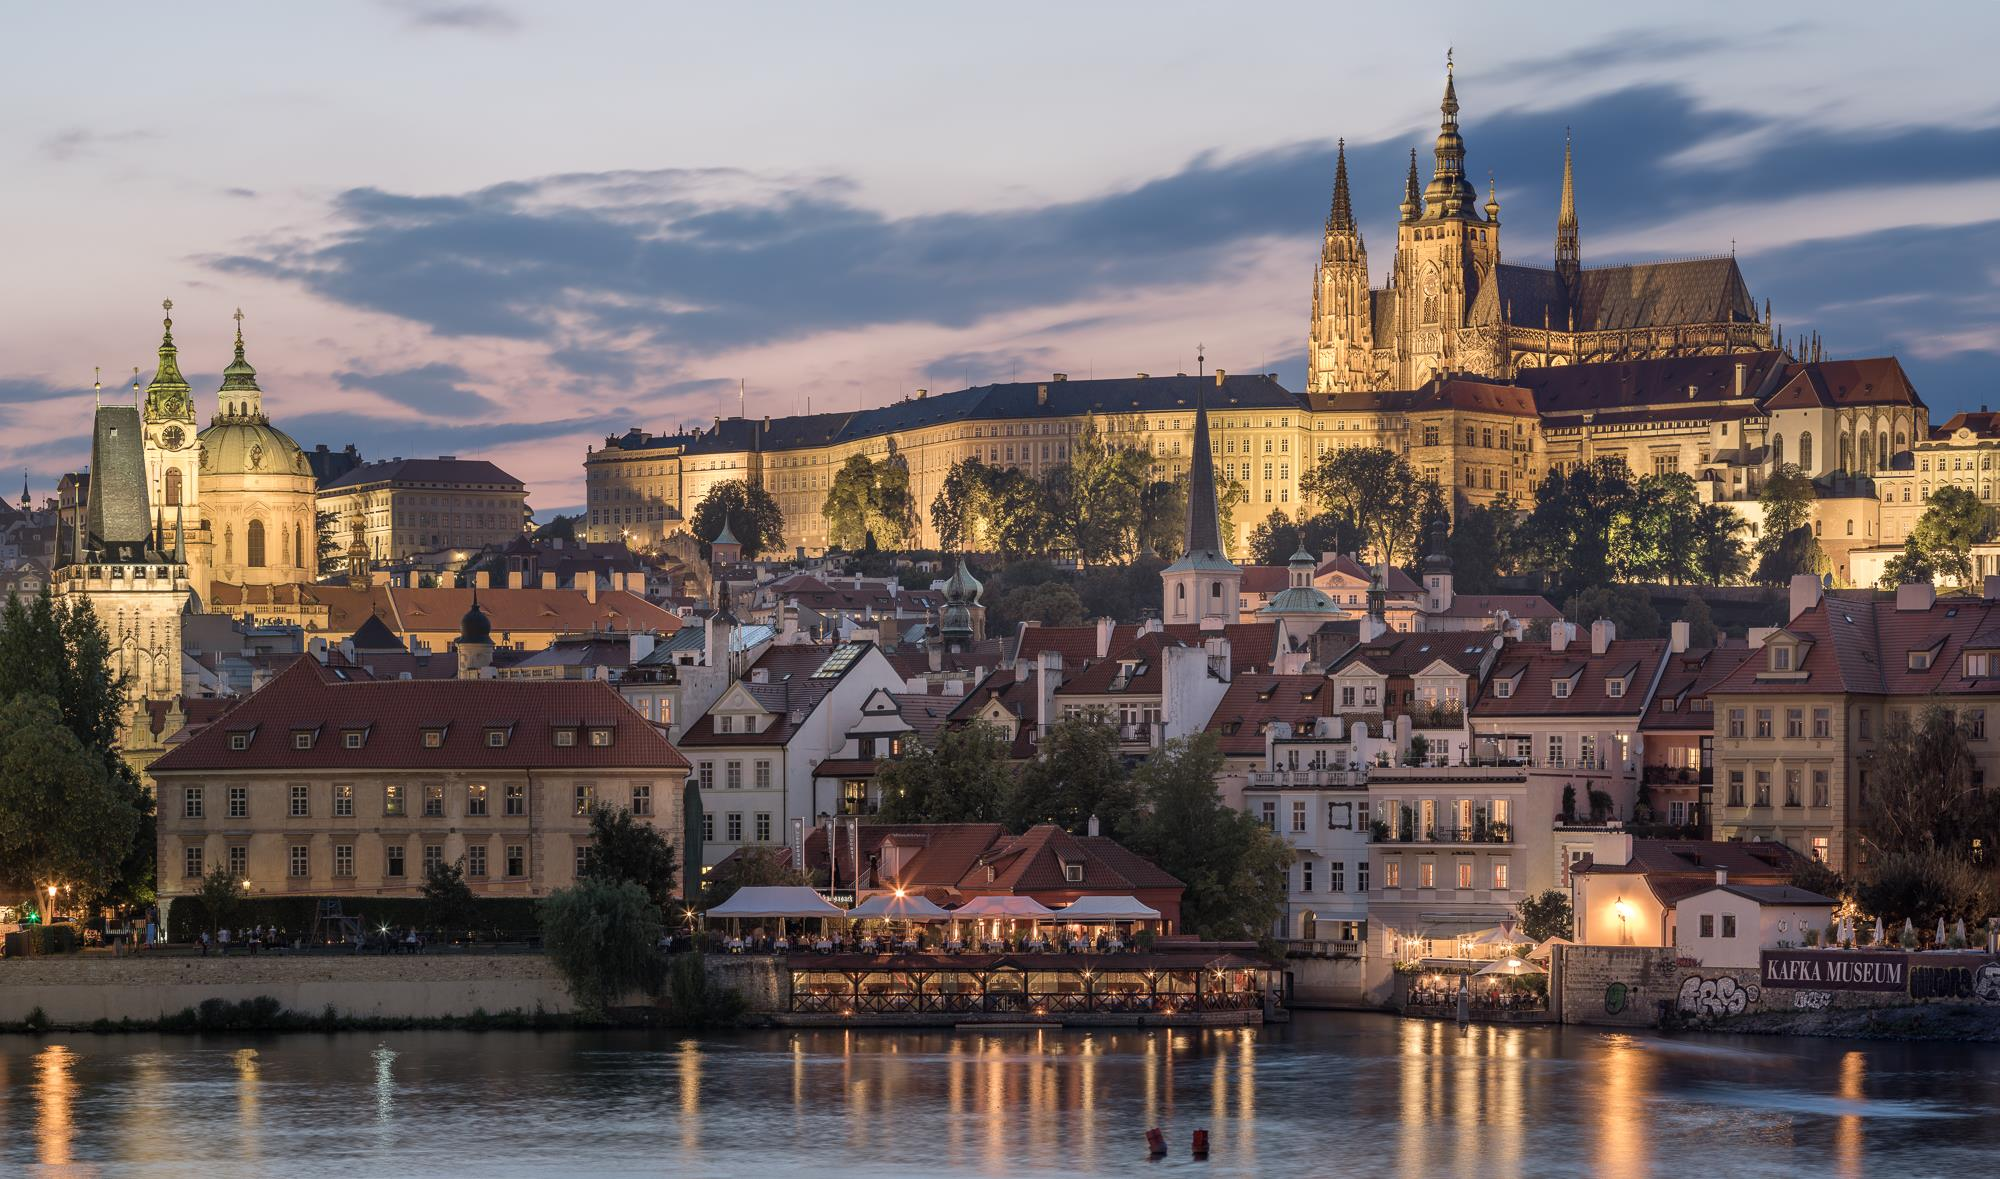 Praga (vir: www.goodlifestyle.si)